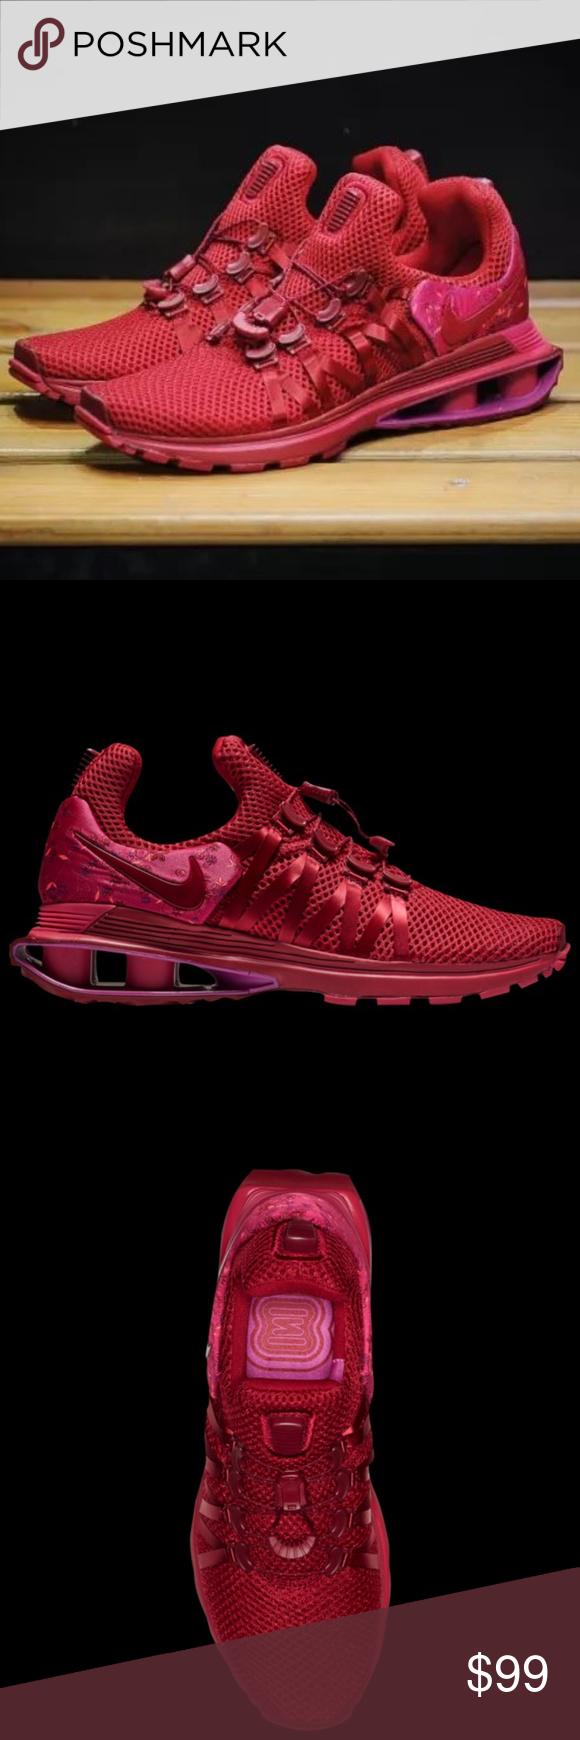 dfbff85e9aa NEW! Nike Shox Gravity Sneaker in Red Crush 🌹❤ 🍒 Nike Shox ...